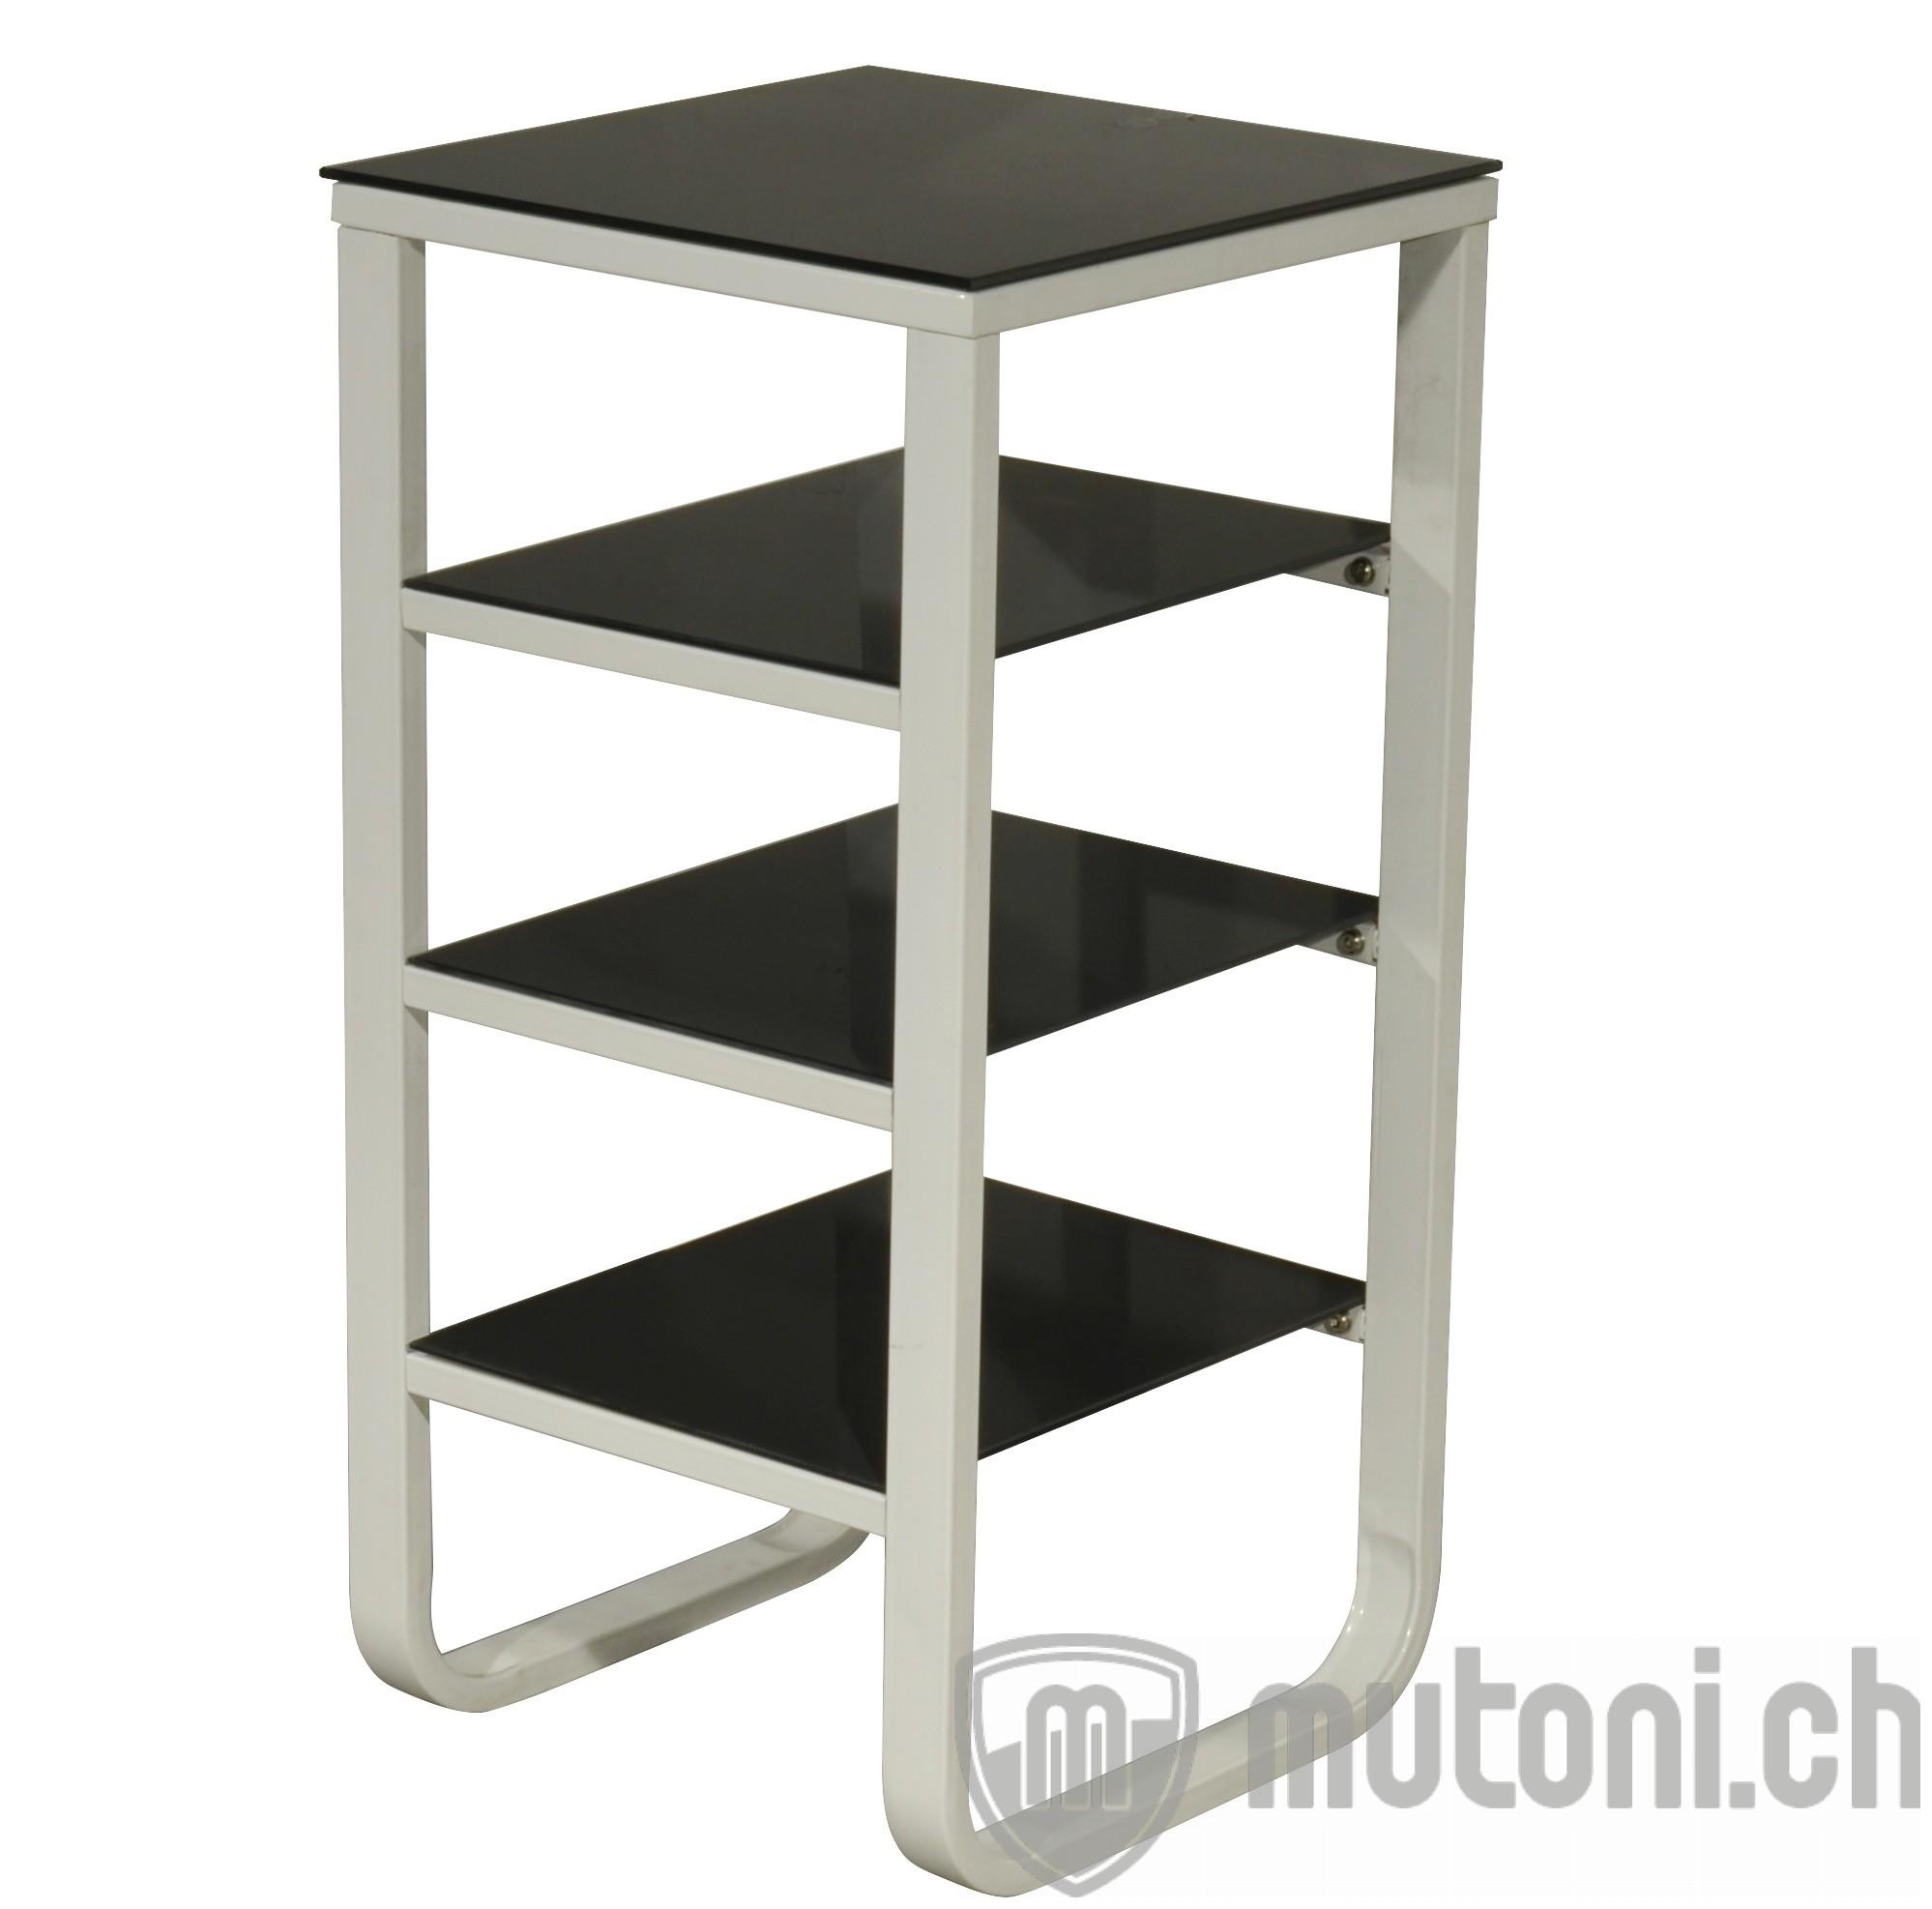 regal tempered 80cm beistellregale regale wohnzimmer m bel mutoni m bel. Black Bedroom Furniture Sets. Home Design Ideas